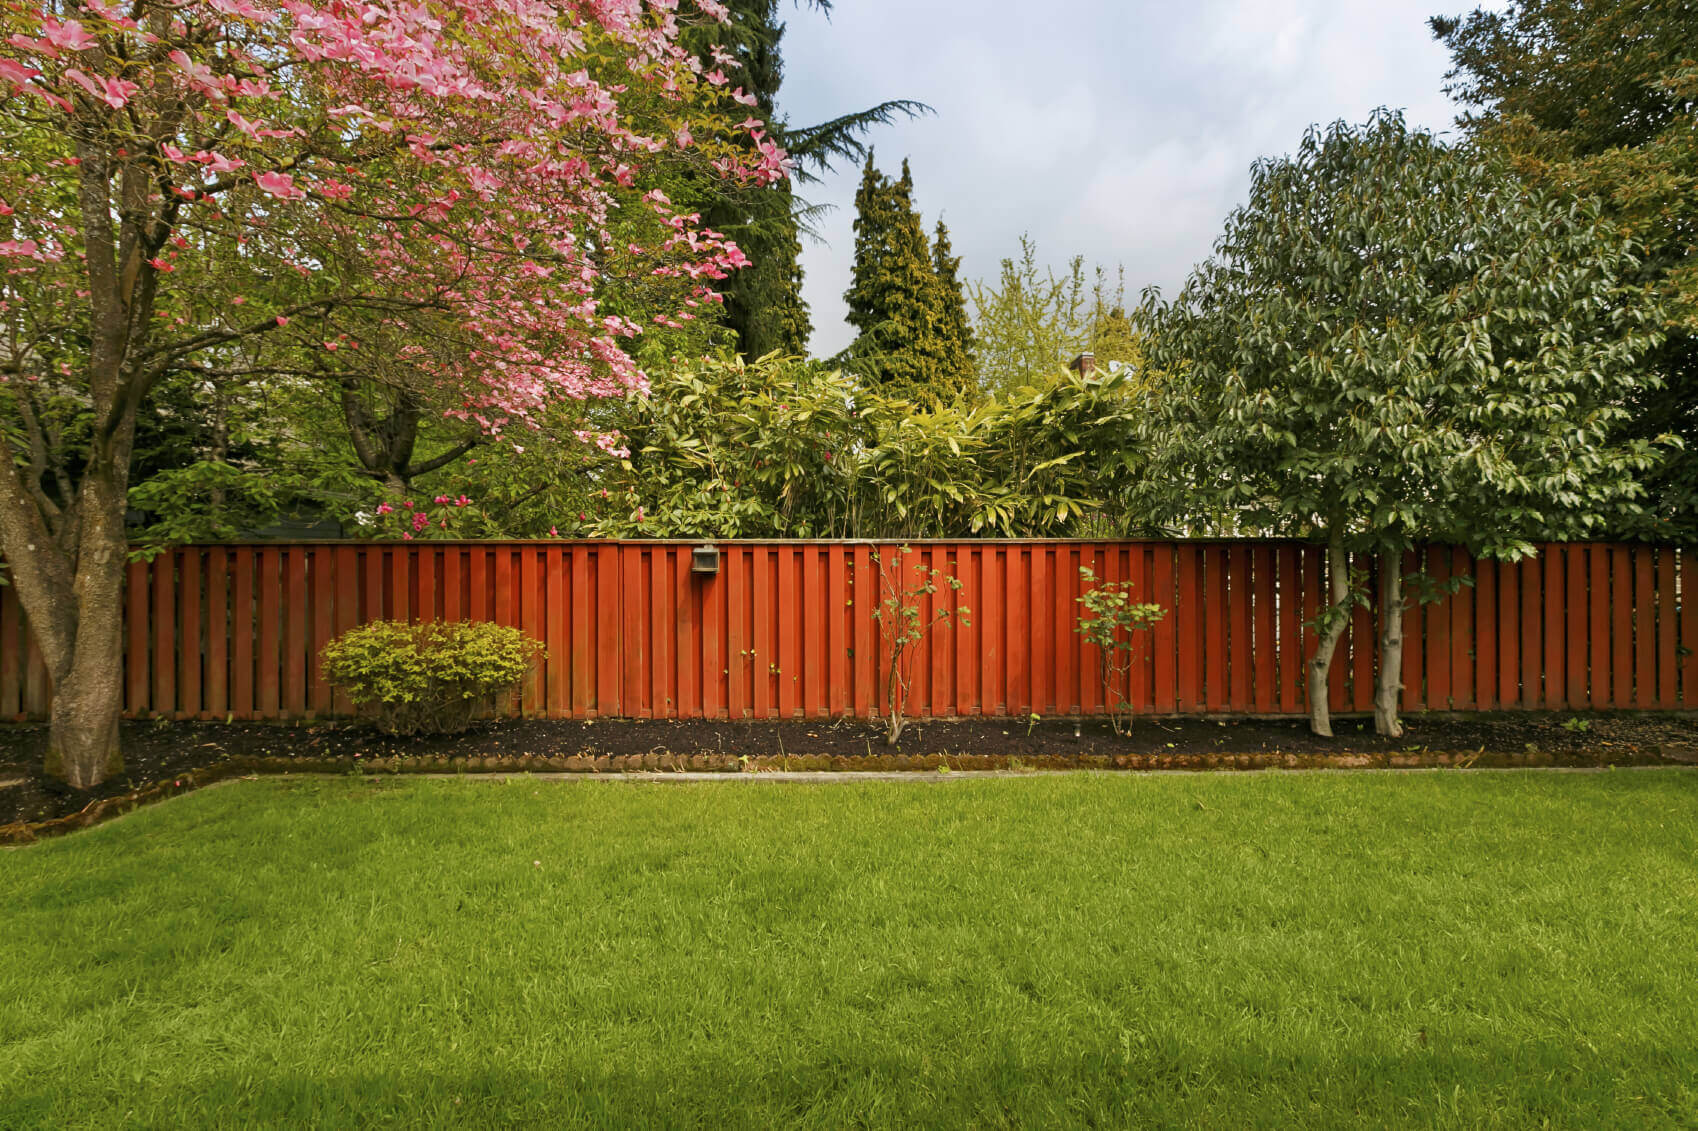 23 Brilliant Backyard Tree Ideas - Home Stratosphere